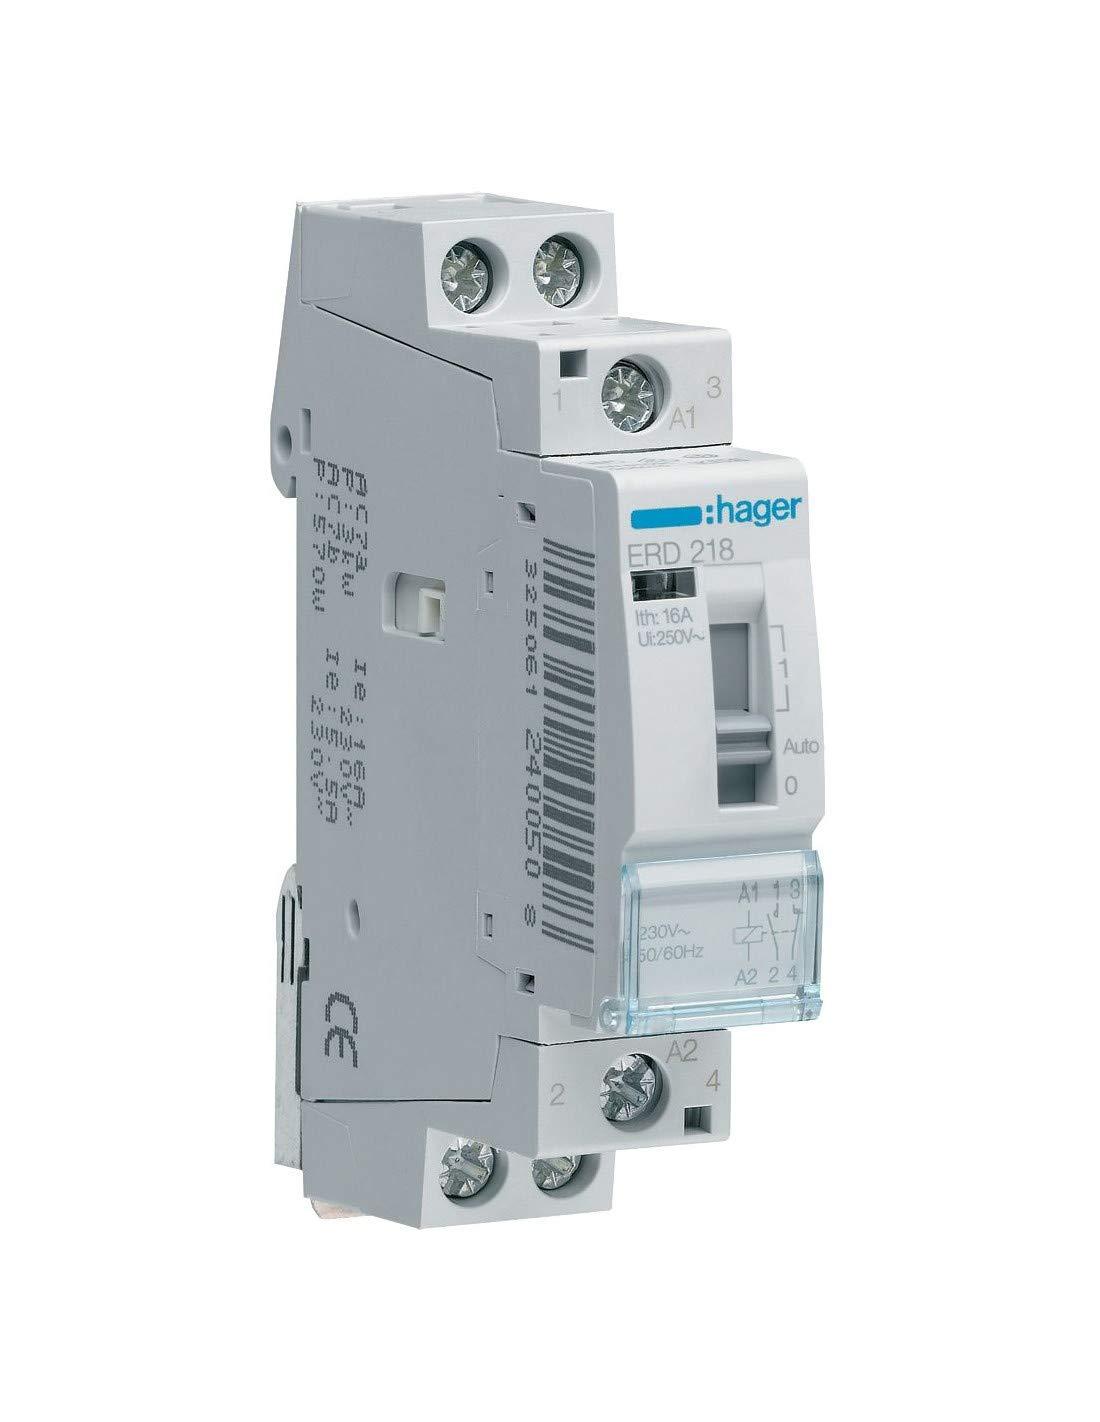 HAGER erc418 Installation Relais 16 A, 2S + 2ö , 230 V 2S + 2ö 230V